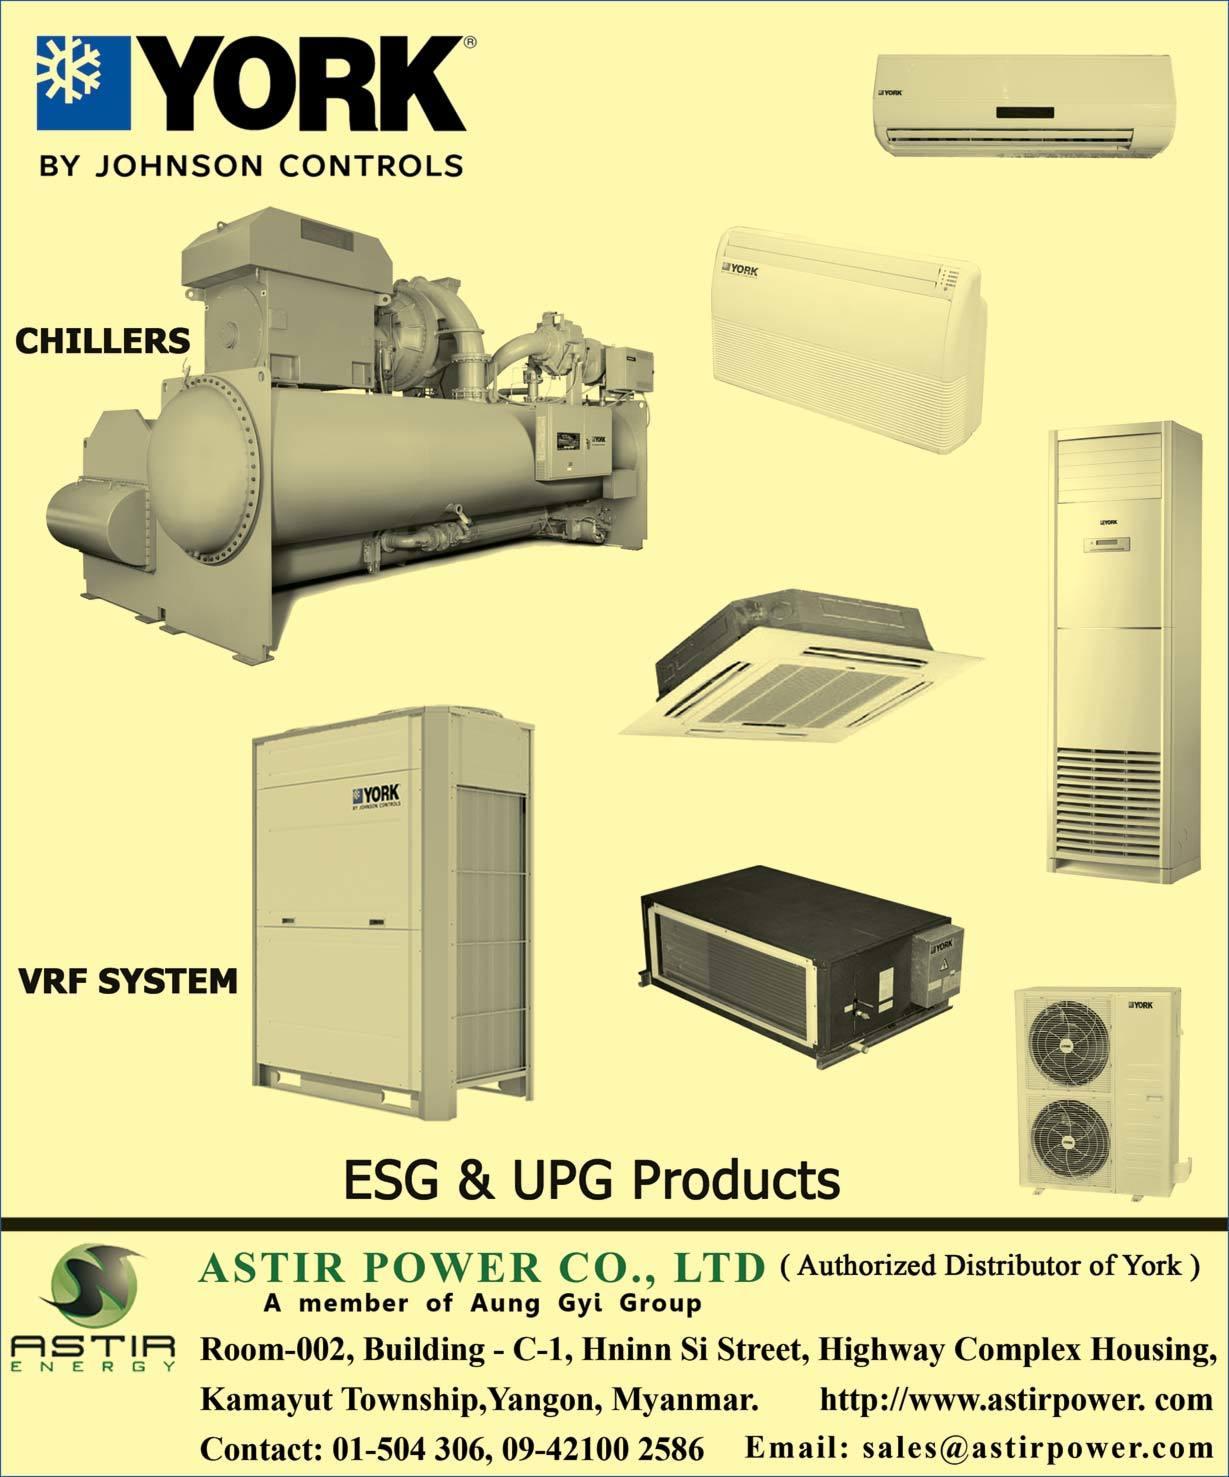 astir power co., ltd. - air conditioning equipment sales & repair